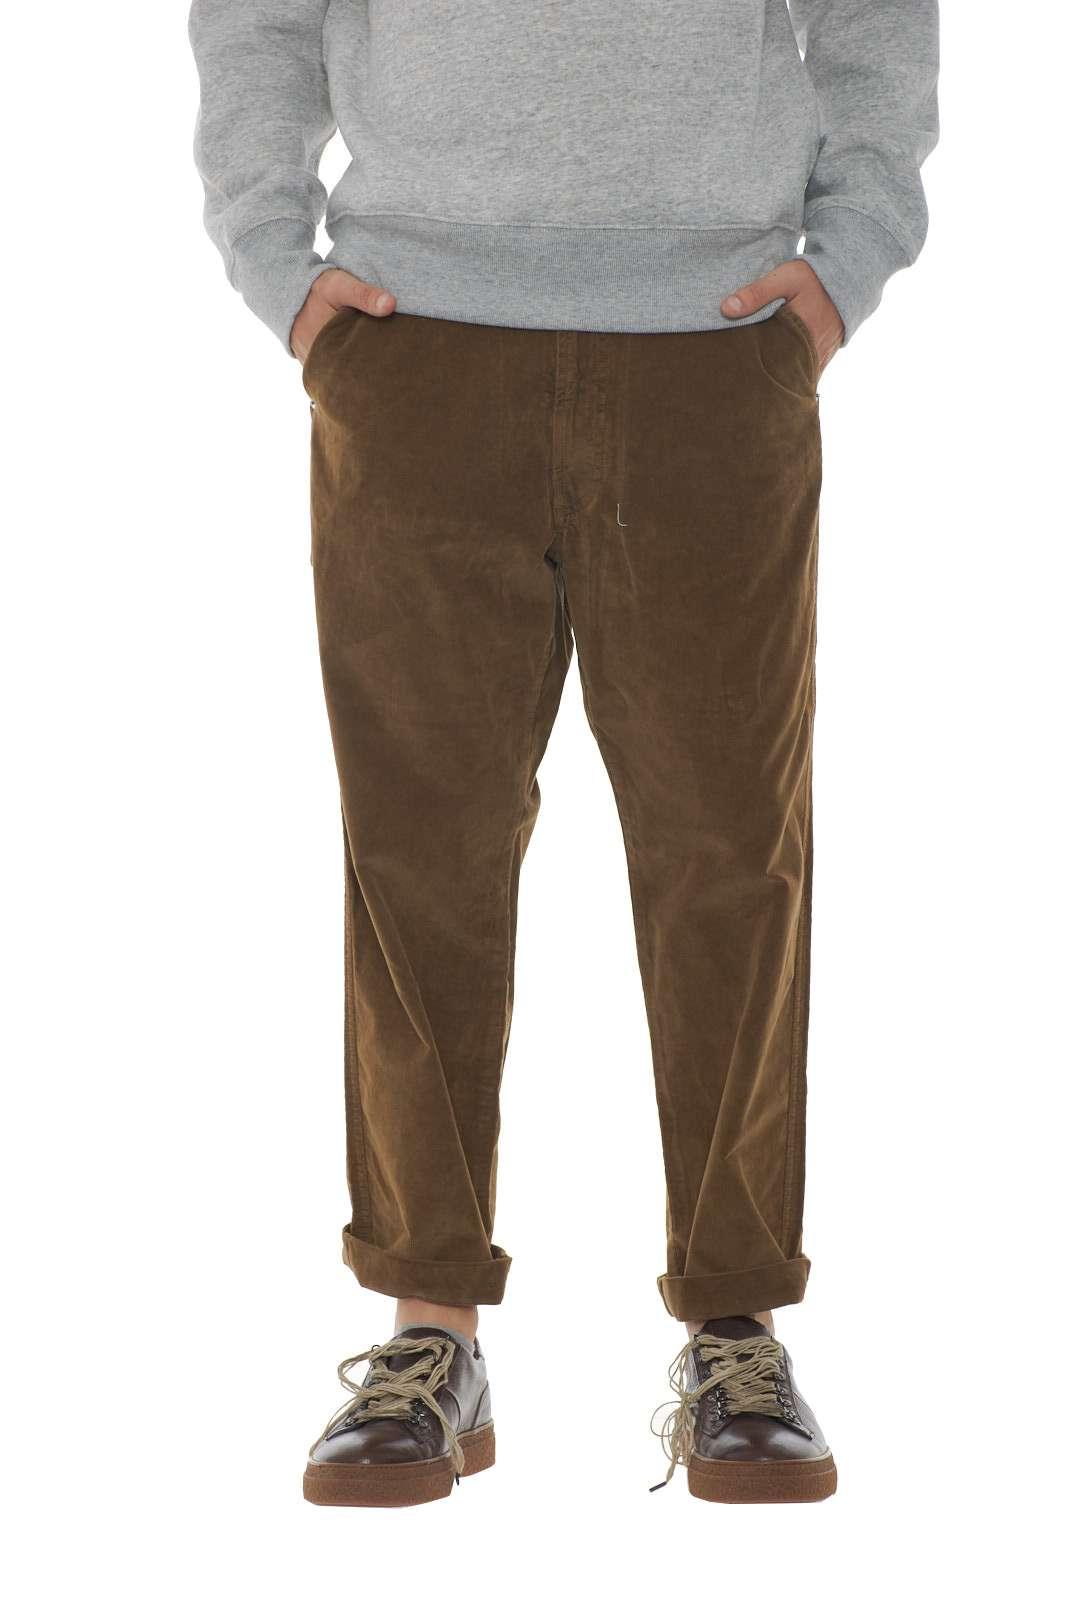 https://www.parmax.com/media/catalog/product/a/i/AI-outlet_parmax-pantaloni-uomo-Diesel-00SZKX0JATD-A_1.jpg